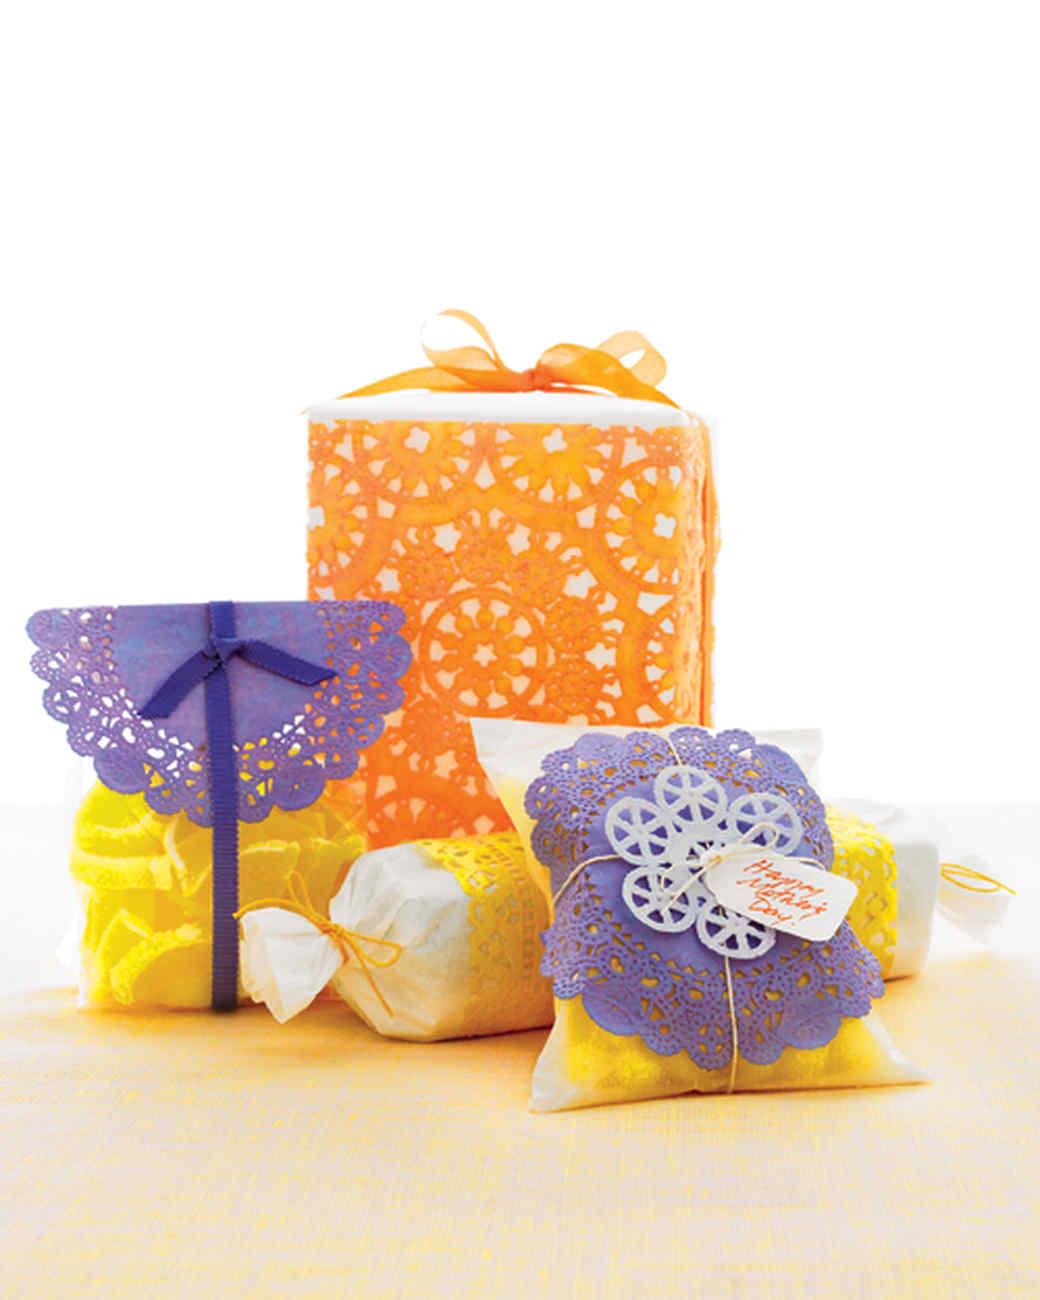 Dyed-Doily Gift Wrap